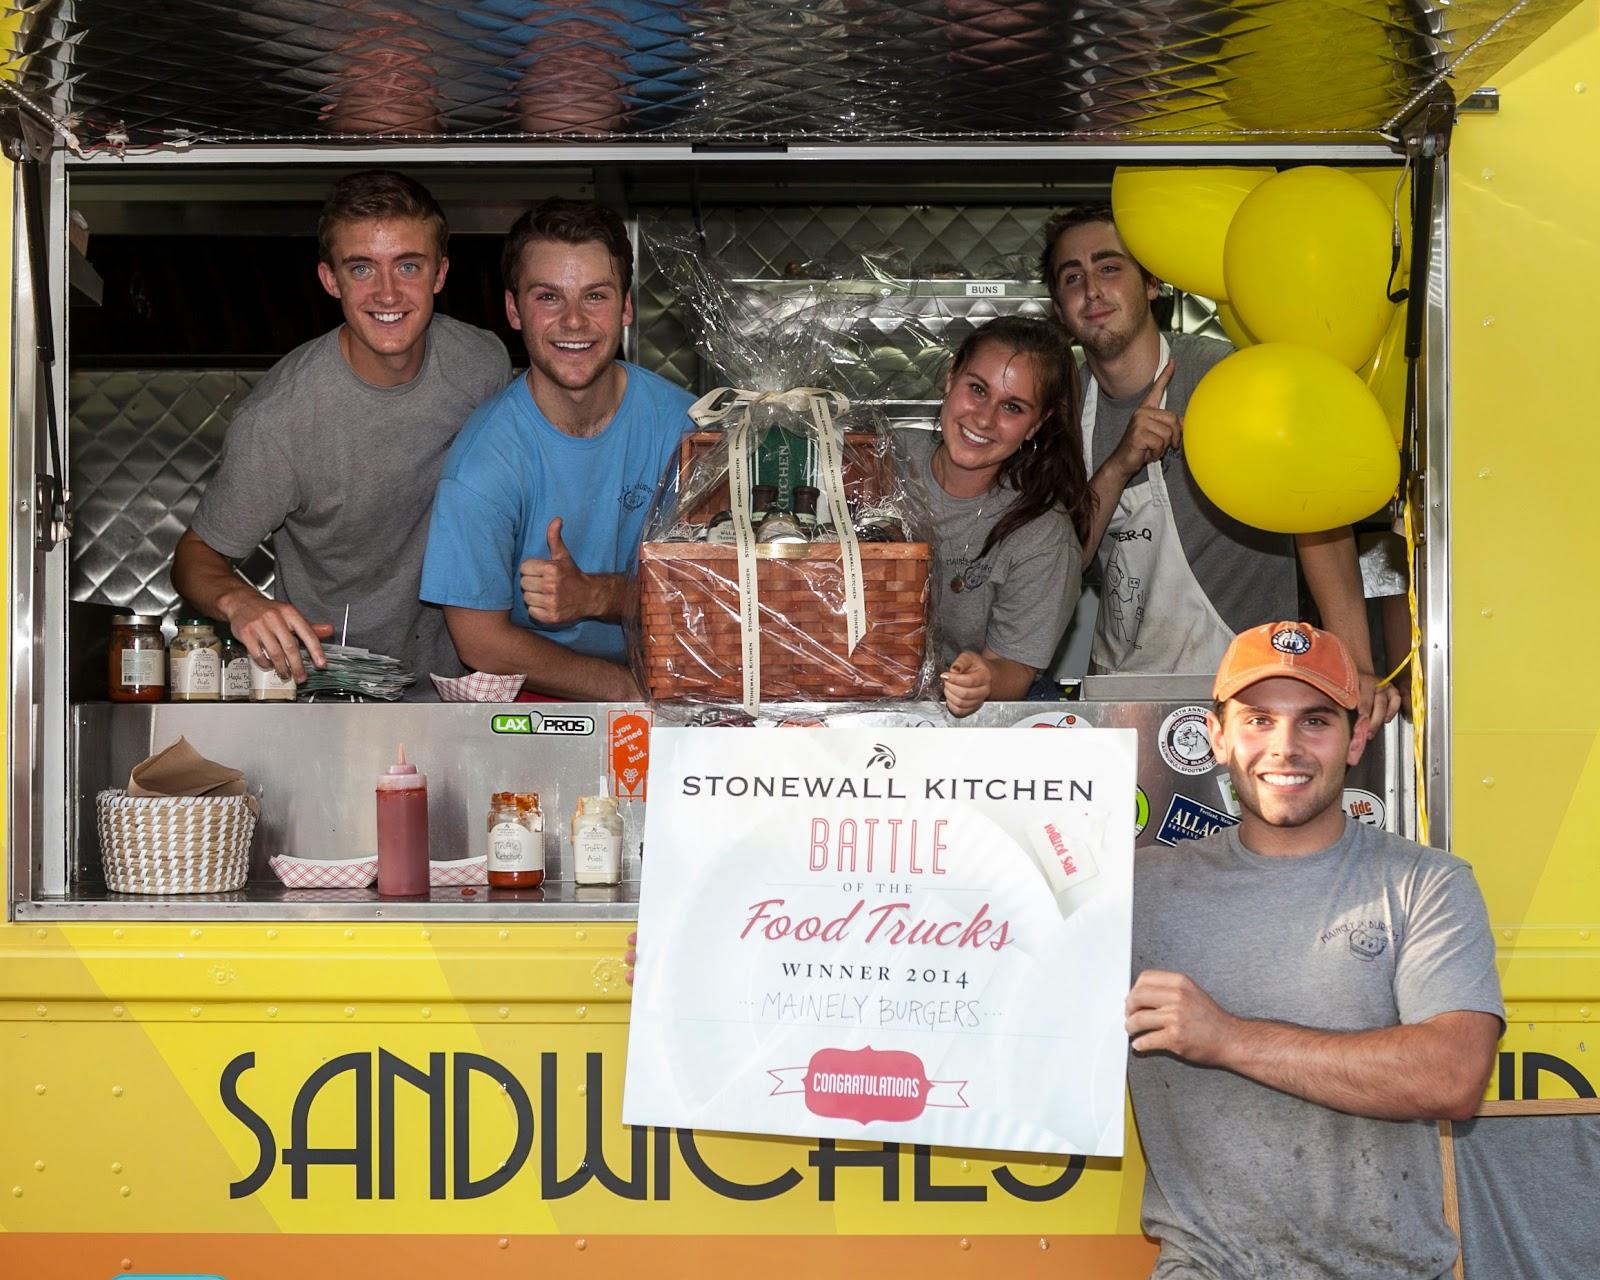 stonewall kitchen 2014 battle of the food trucks